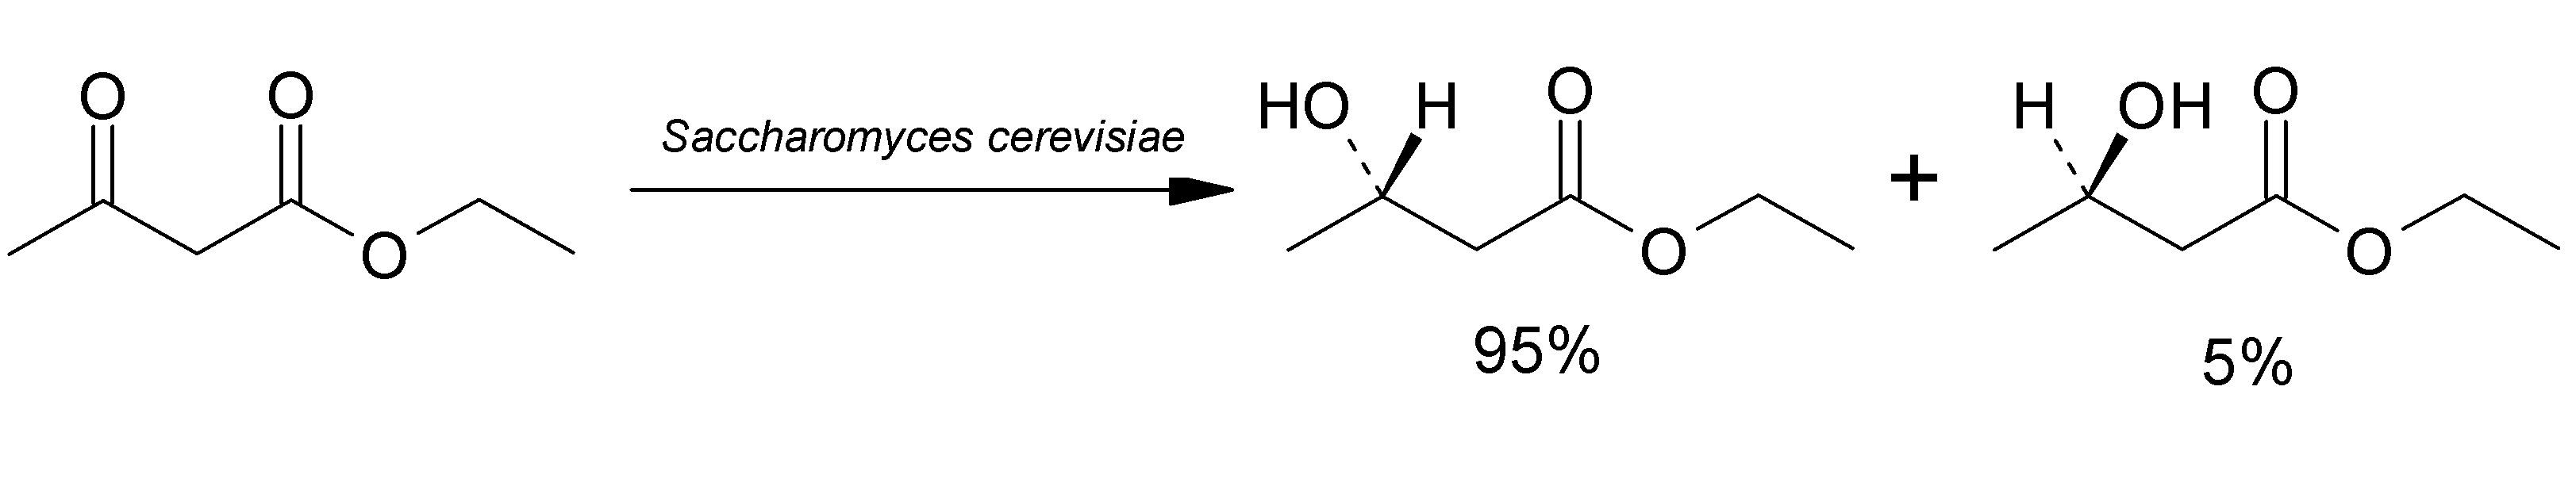 Image of Baker's yeast